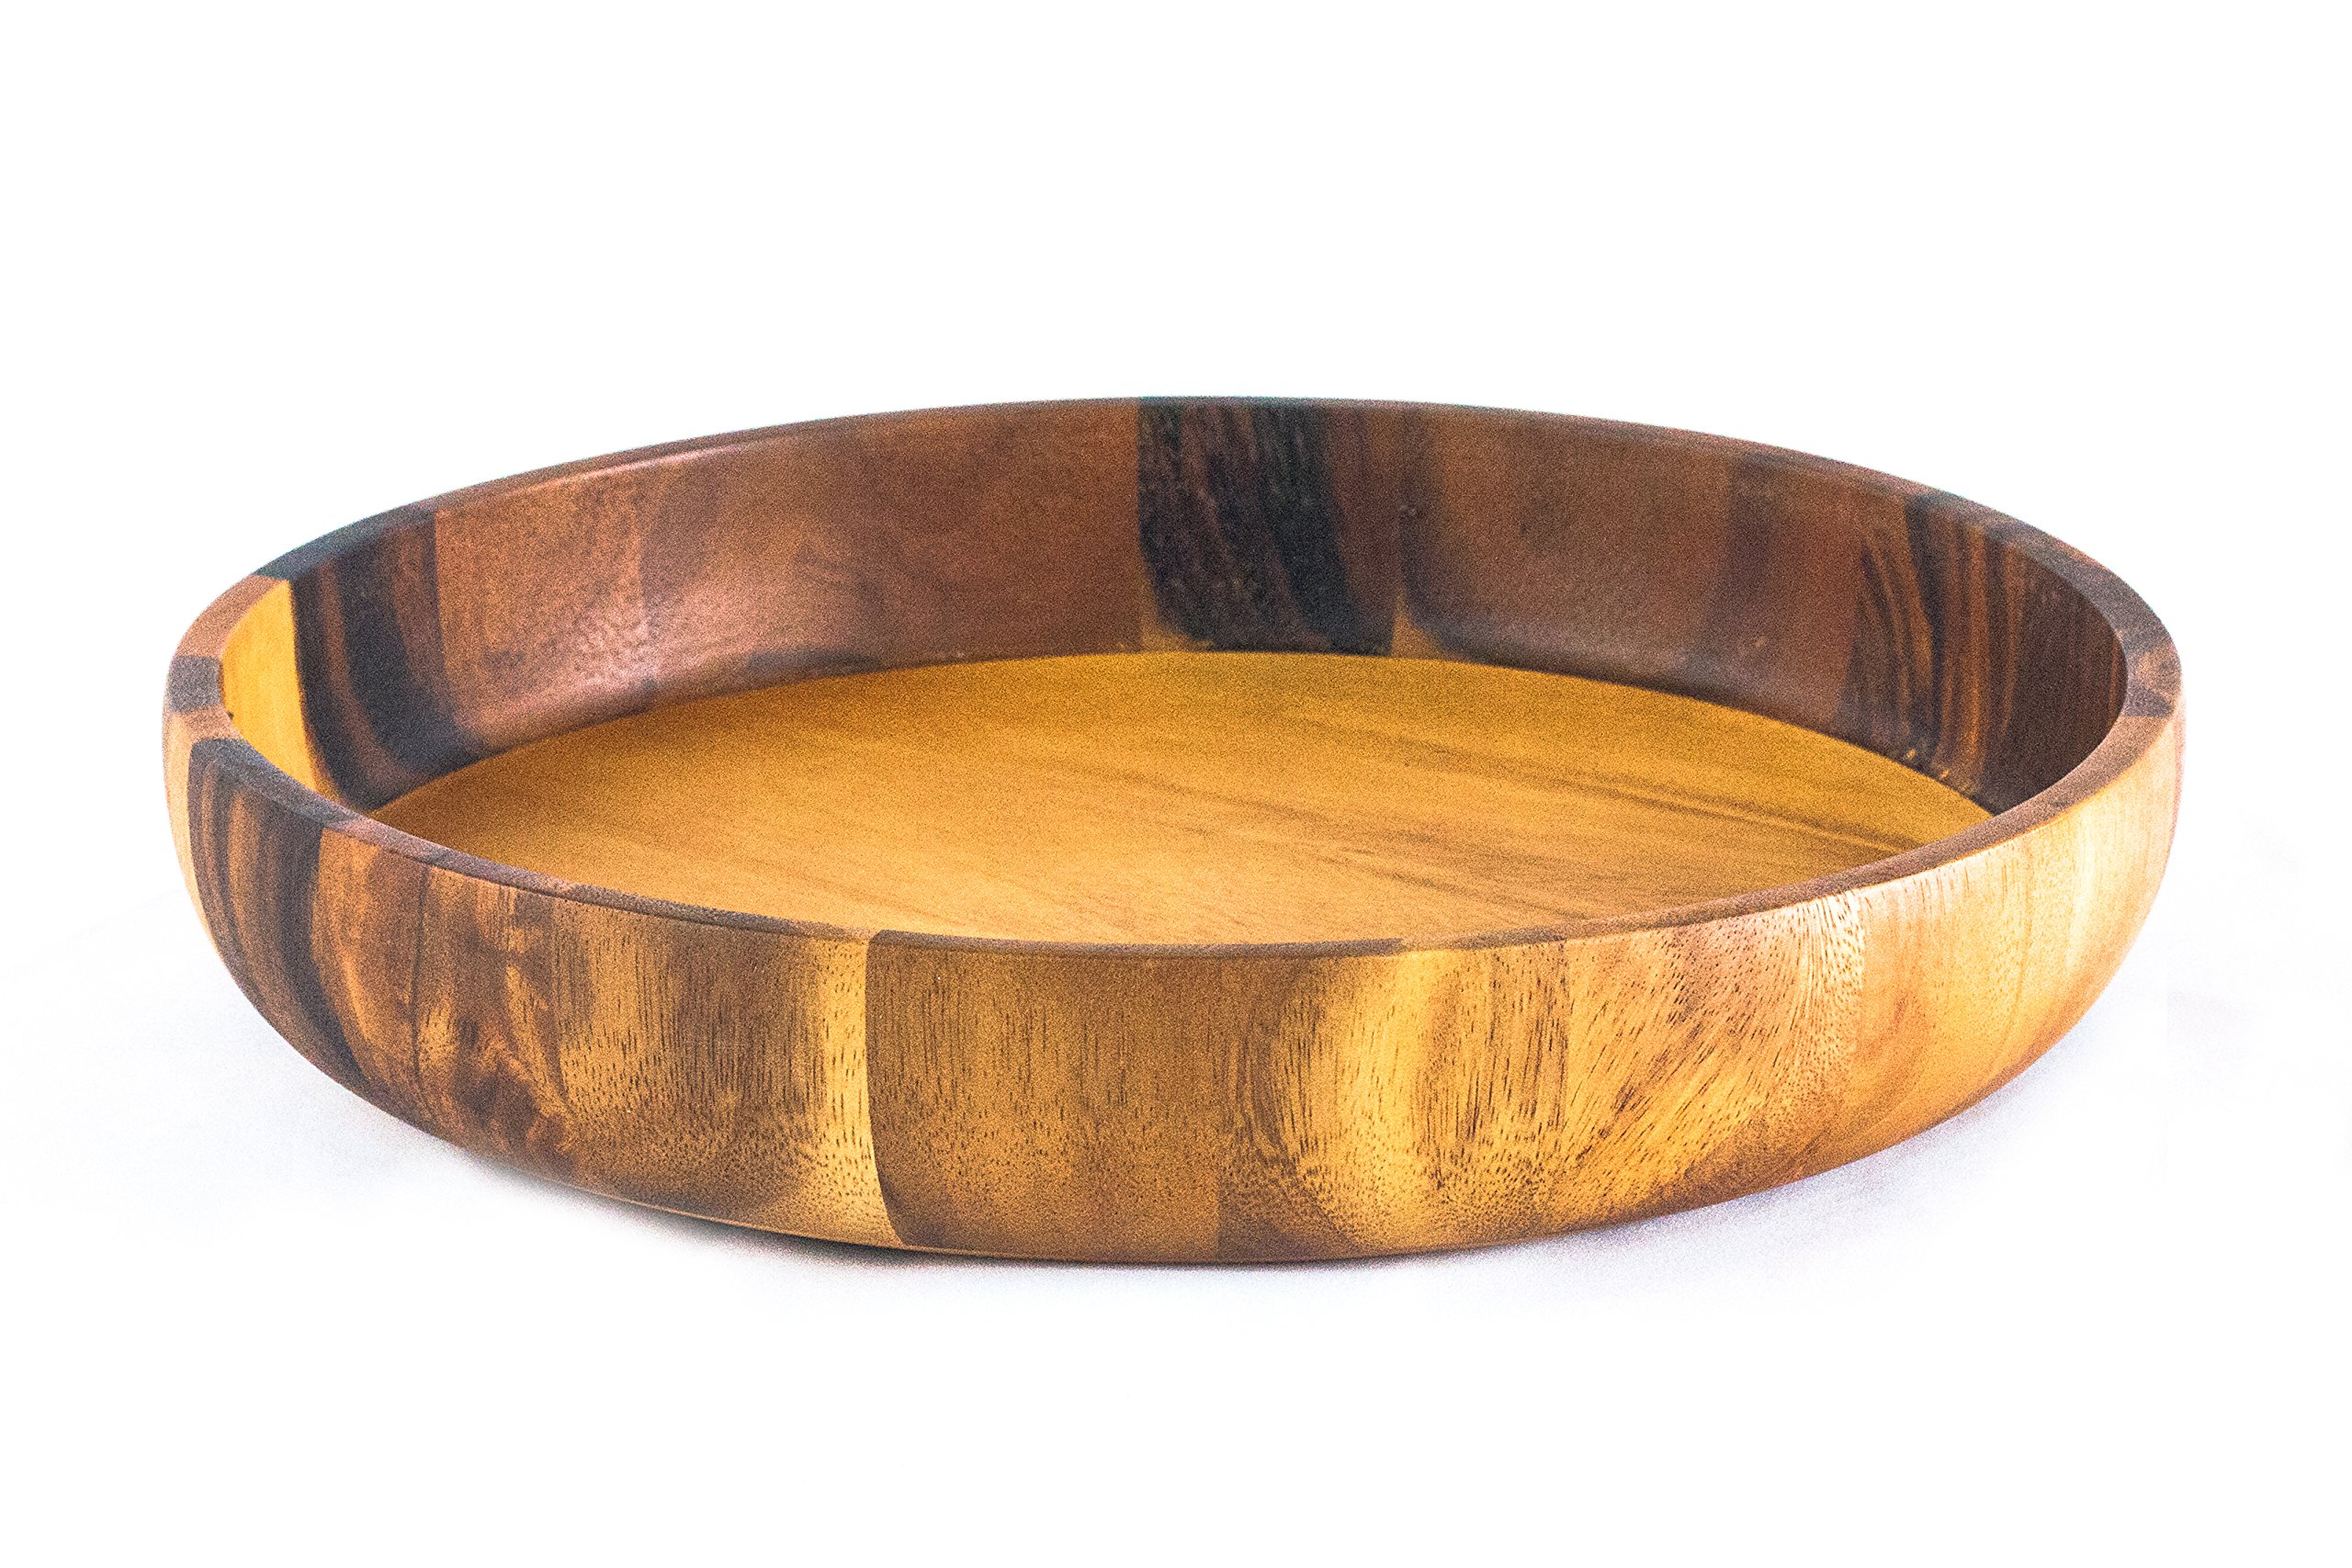 Falin & Lenin's Wood Serving Plate, Crafted Natural Wood Round Serving Tea Tray Salad,Fruit Dessert Cake Snack,Large Platter, 14'' Diameter x 2.4'' Height